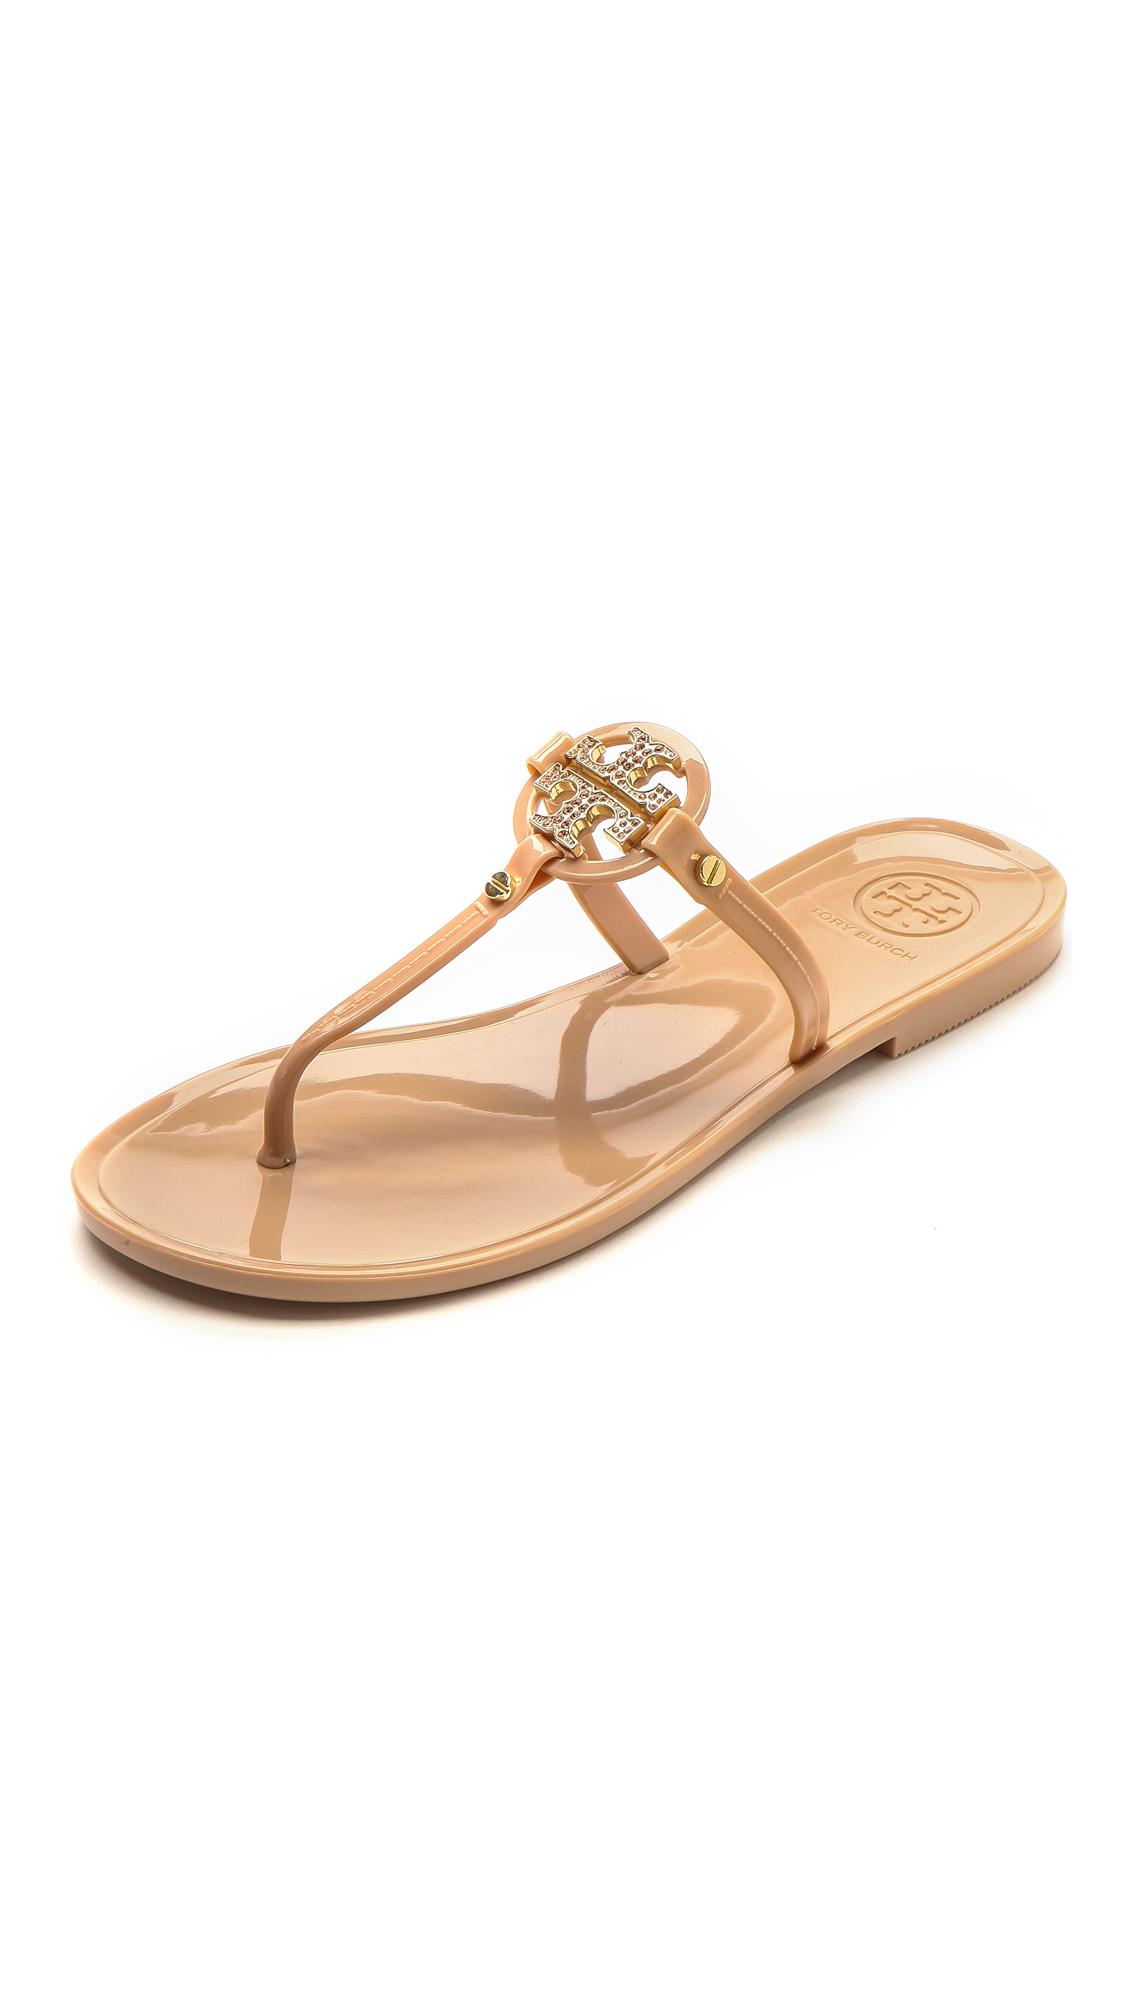 7c6e077bff5ea7 Lyst - Tory Burch Mini Miller Flat Thong Sandals - Blush in Pink